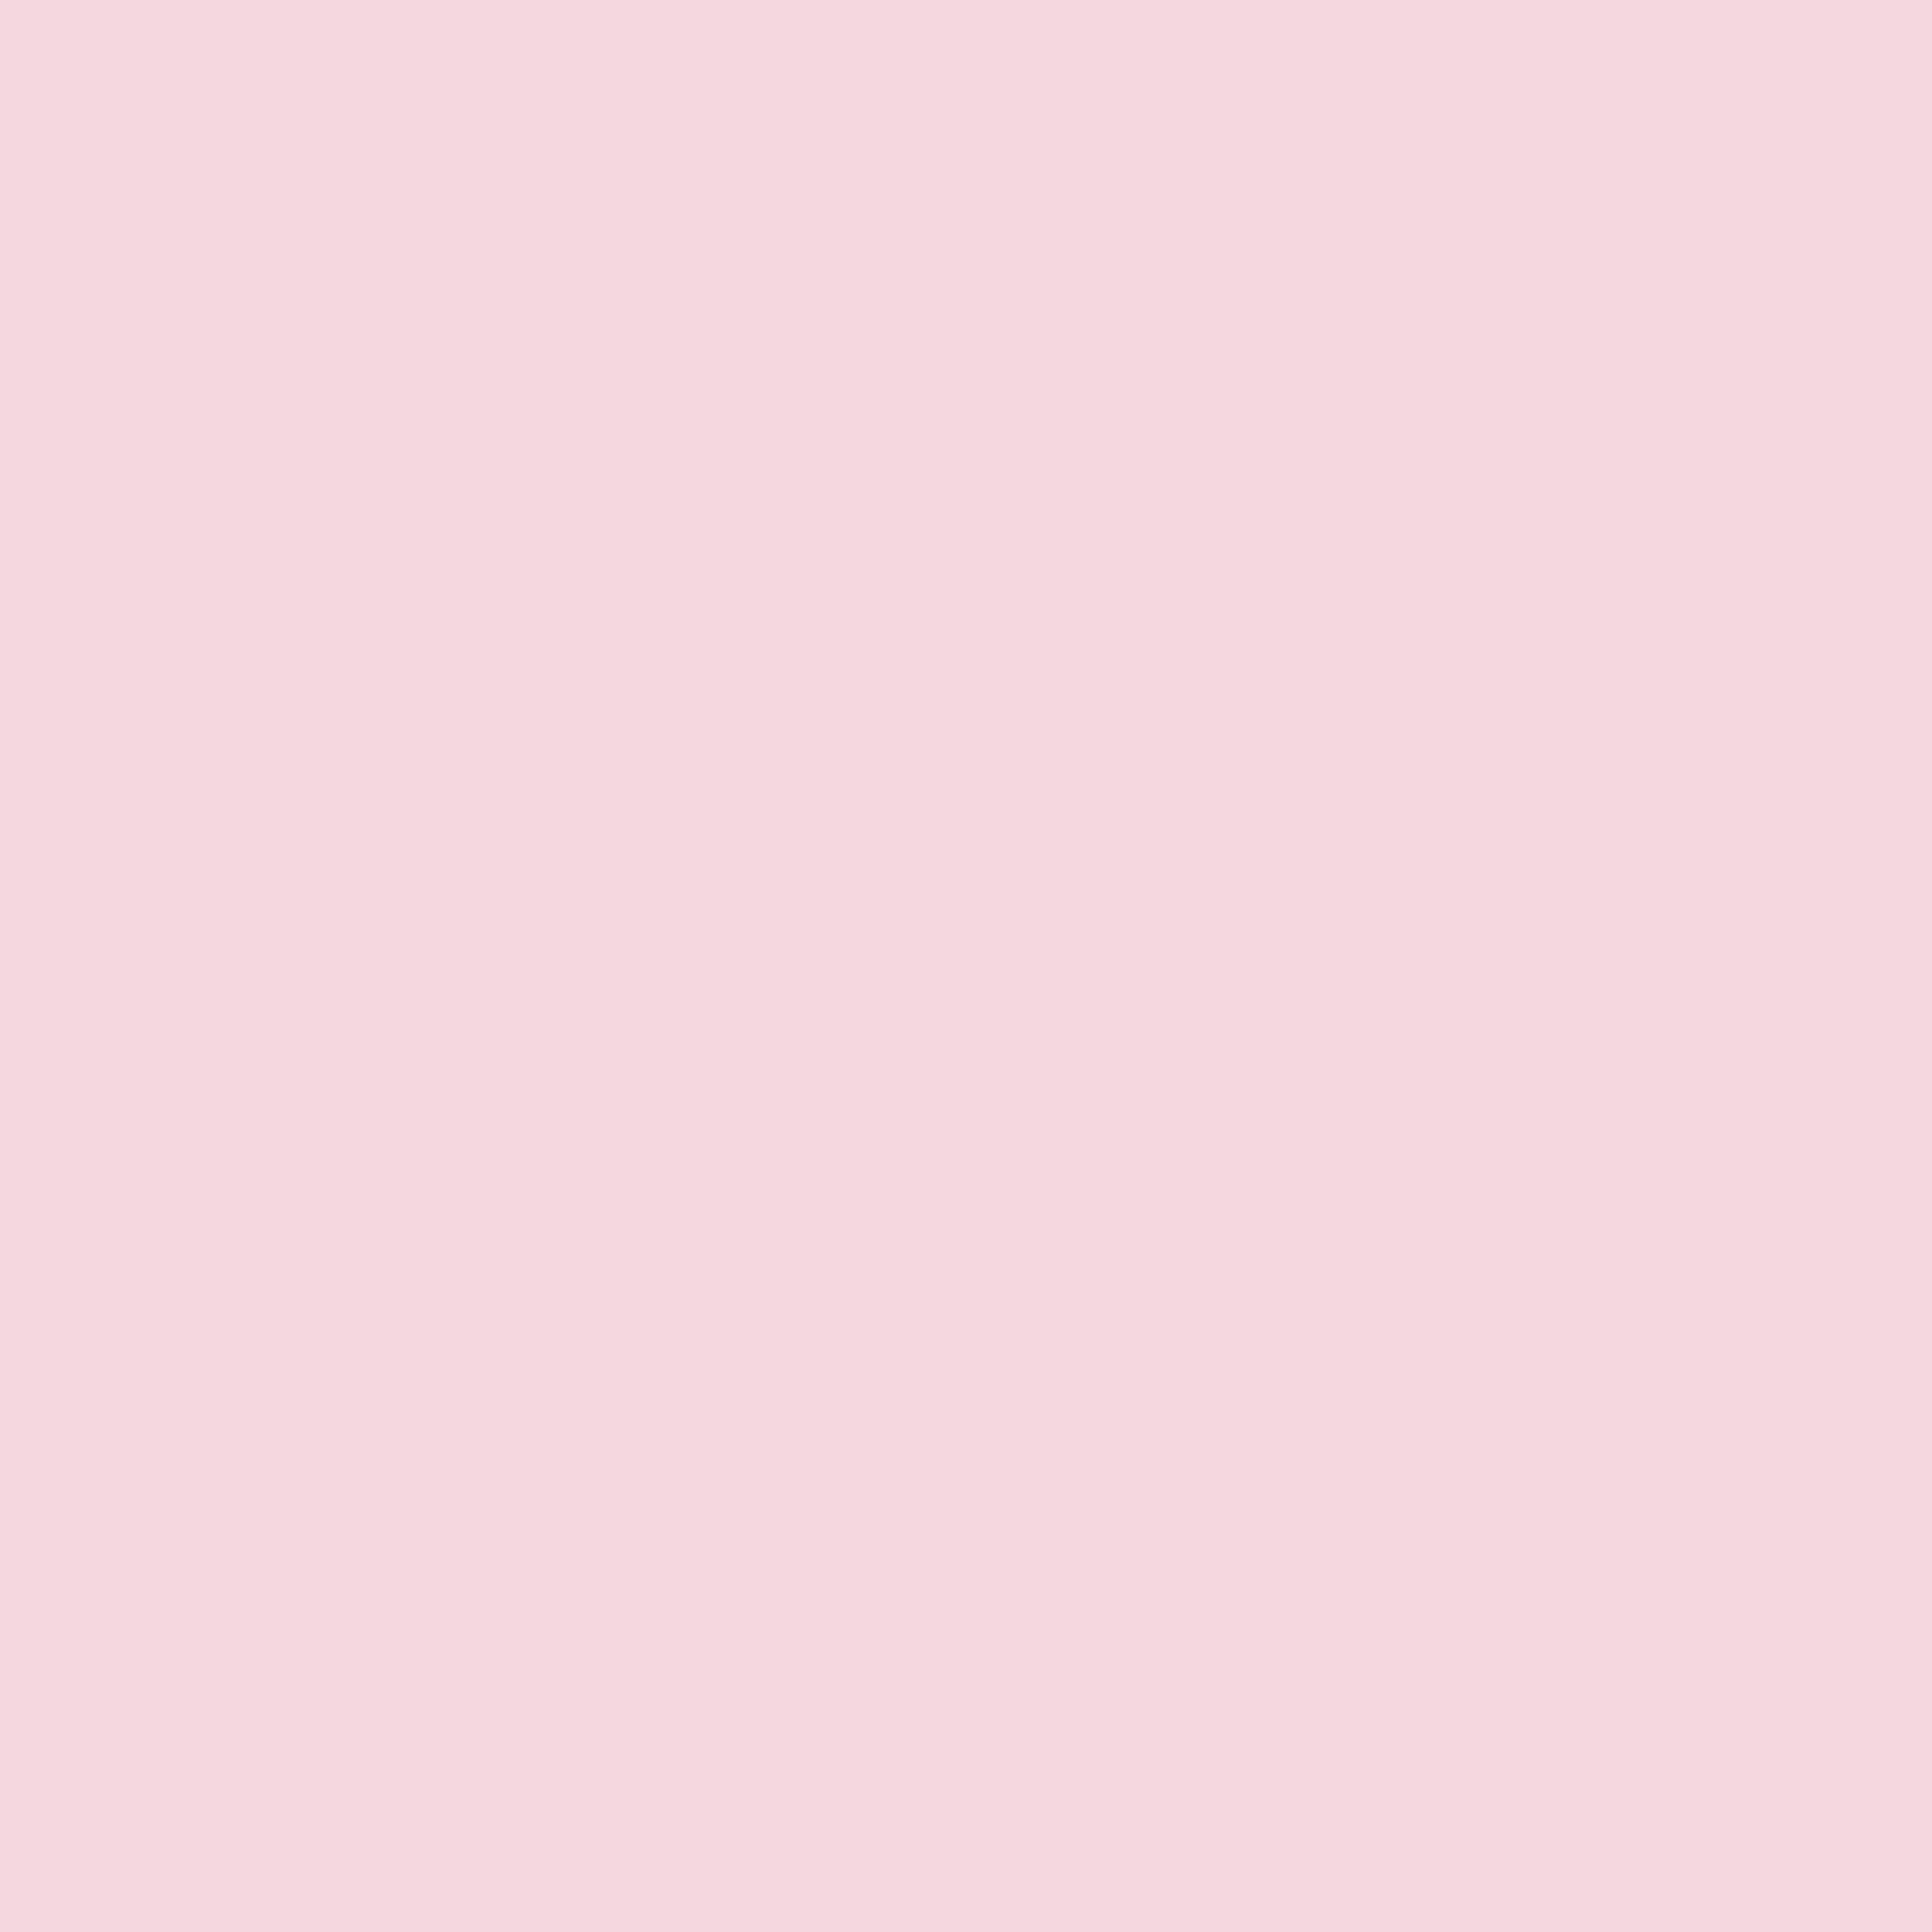 2048x2048 Vanilla Ice Solid Color Background